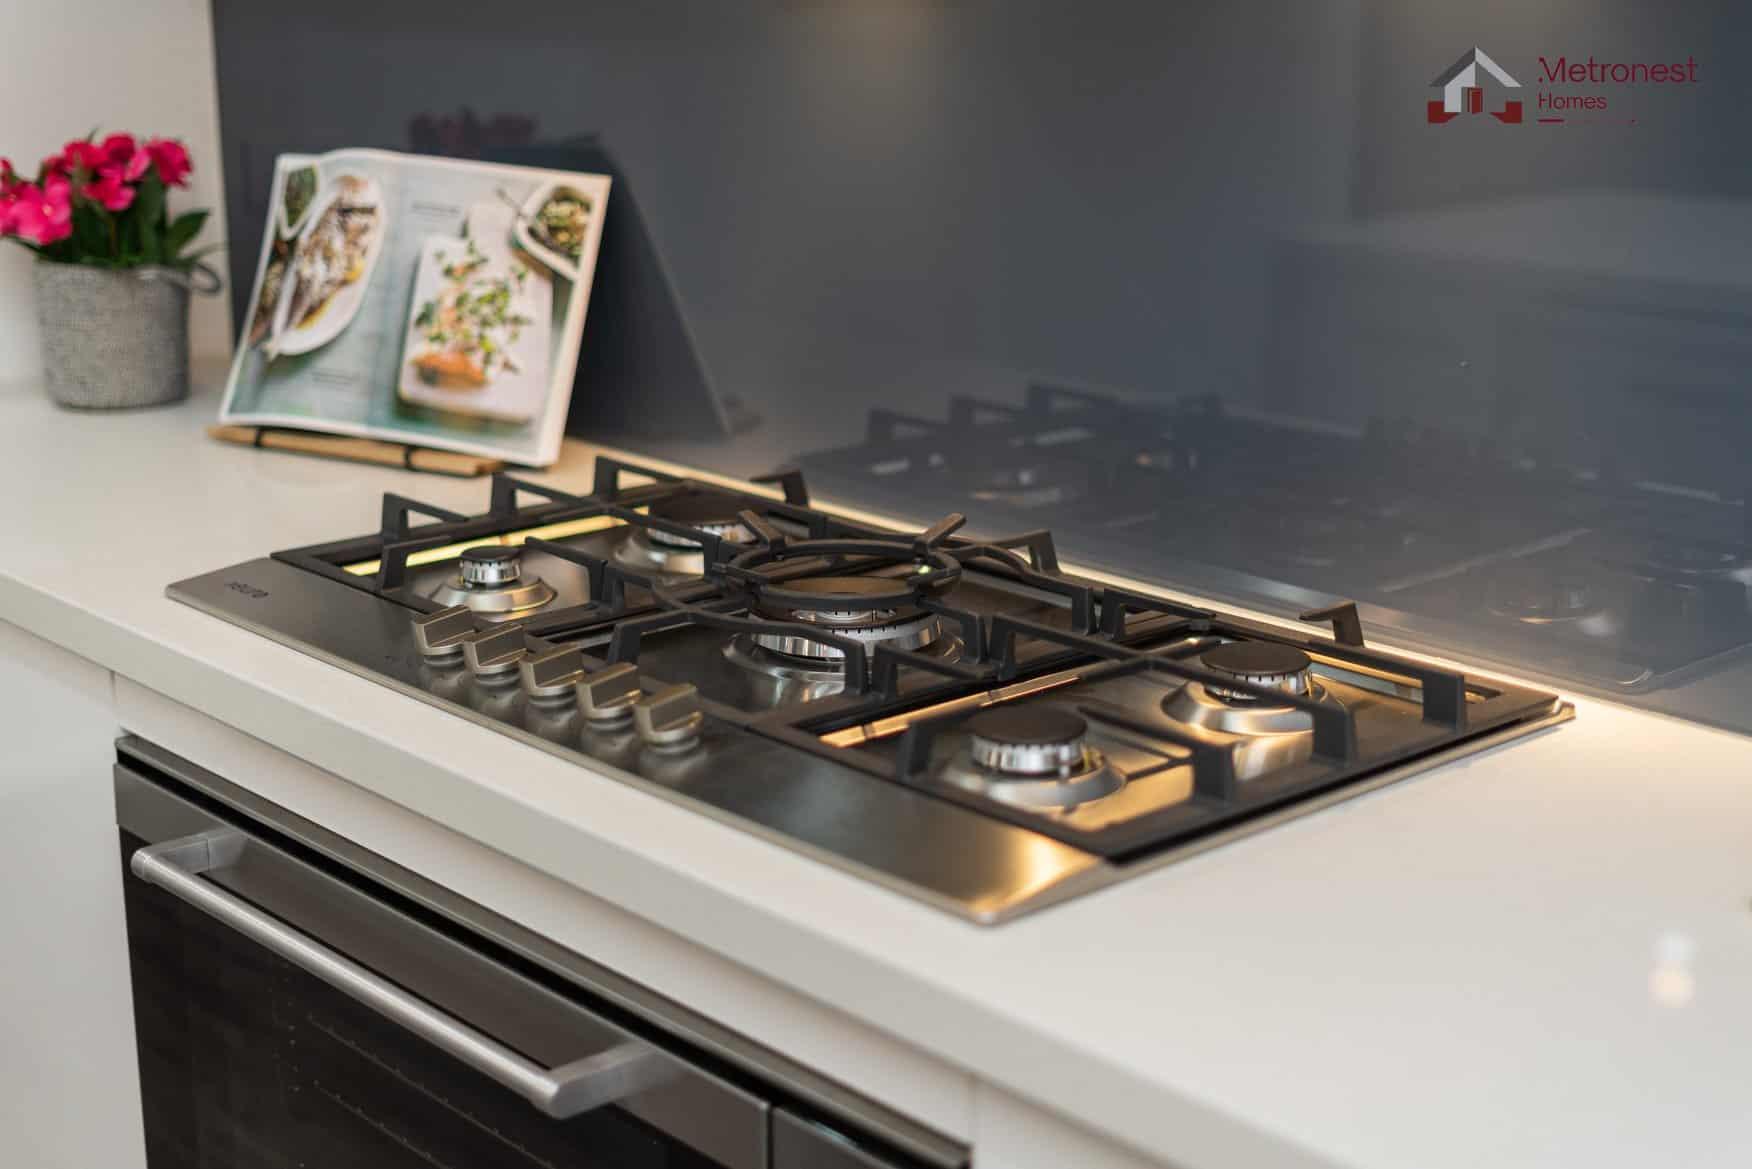 appliances_metronesthomes